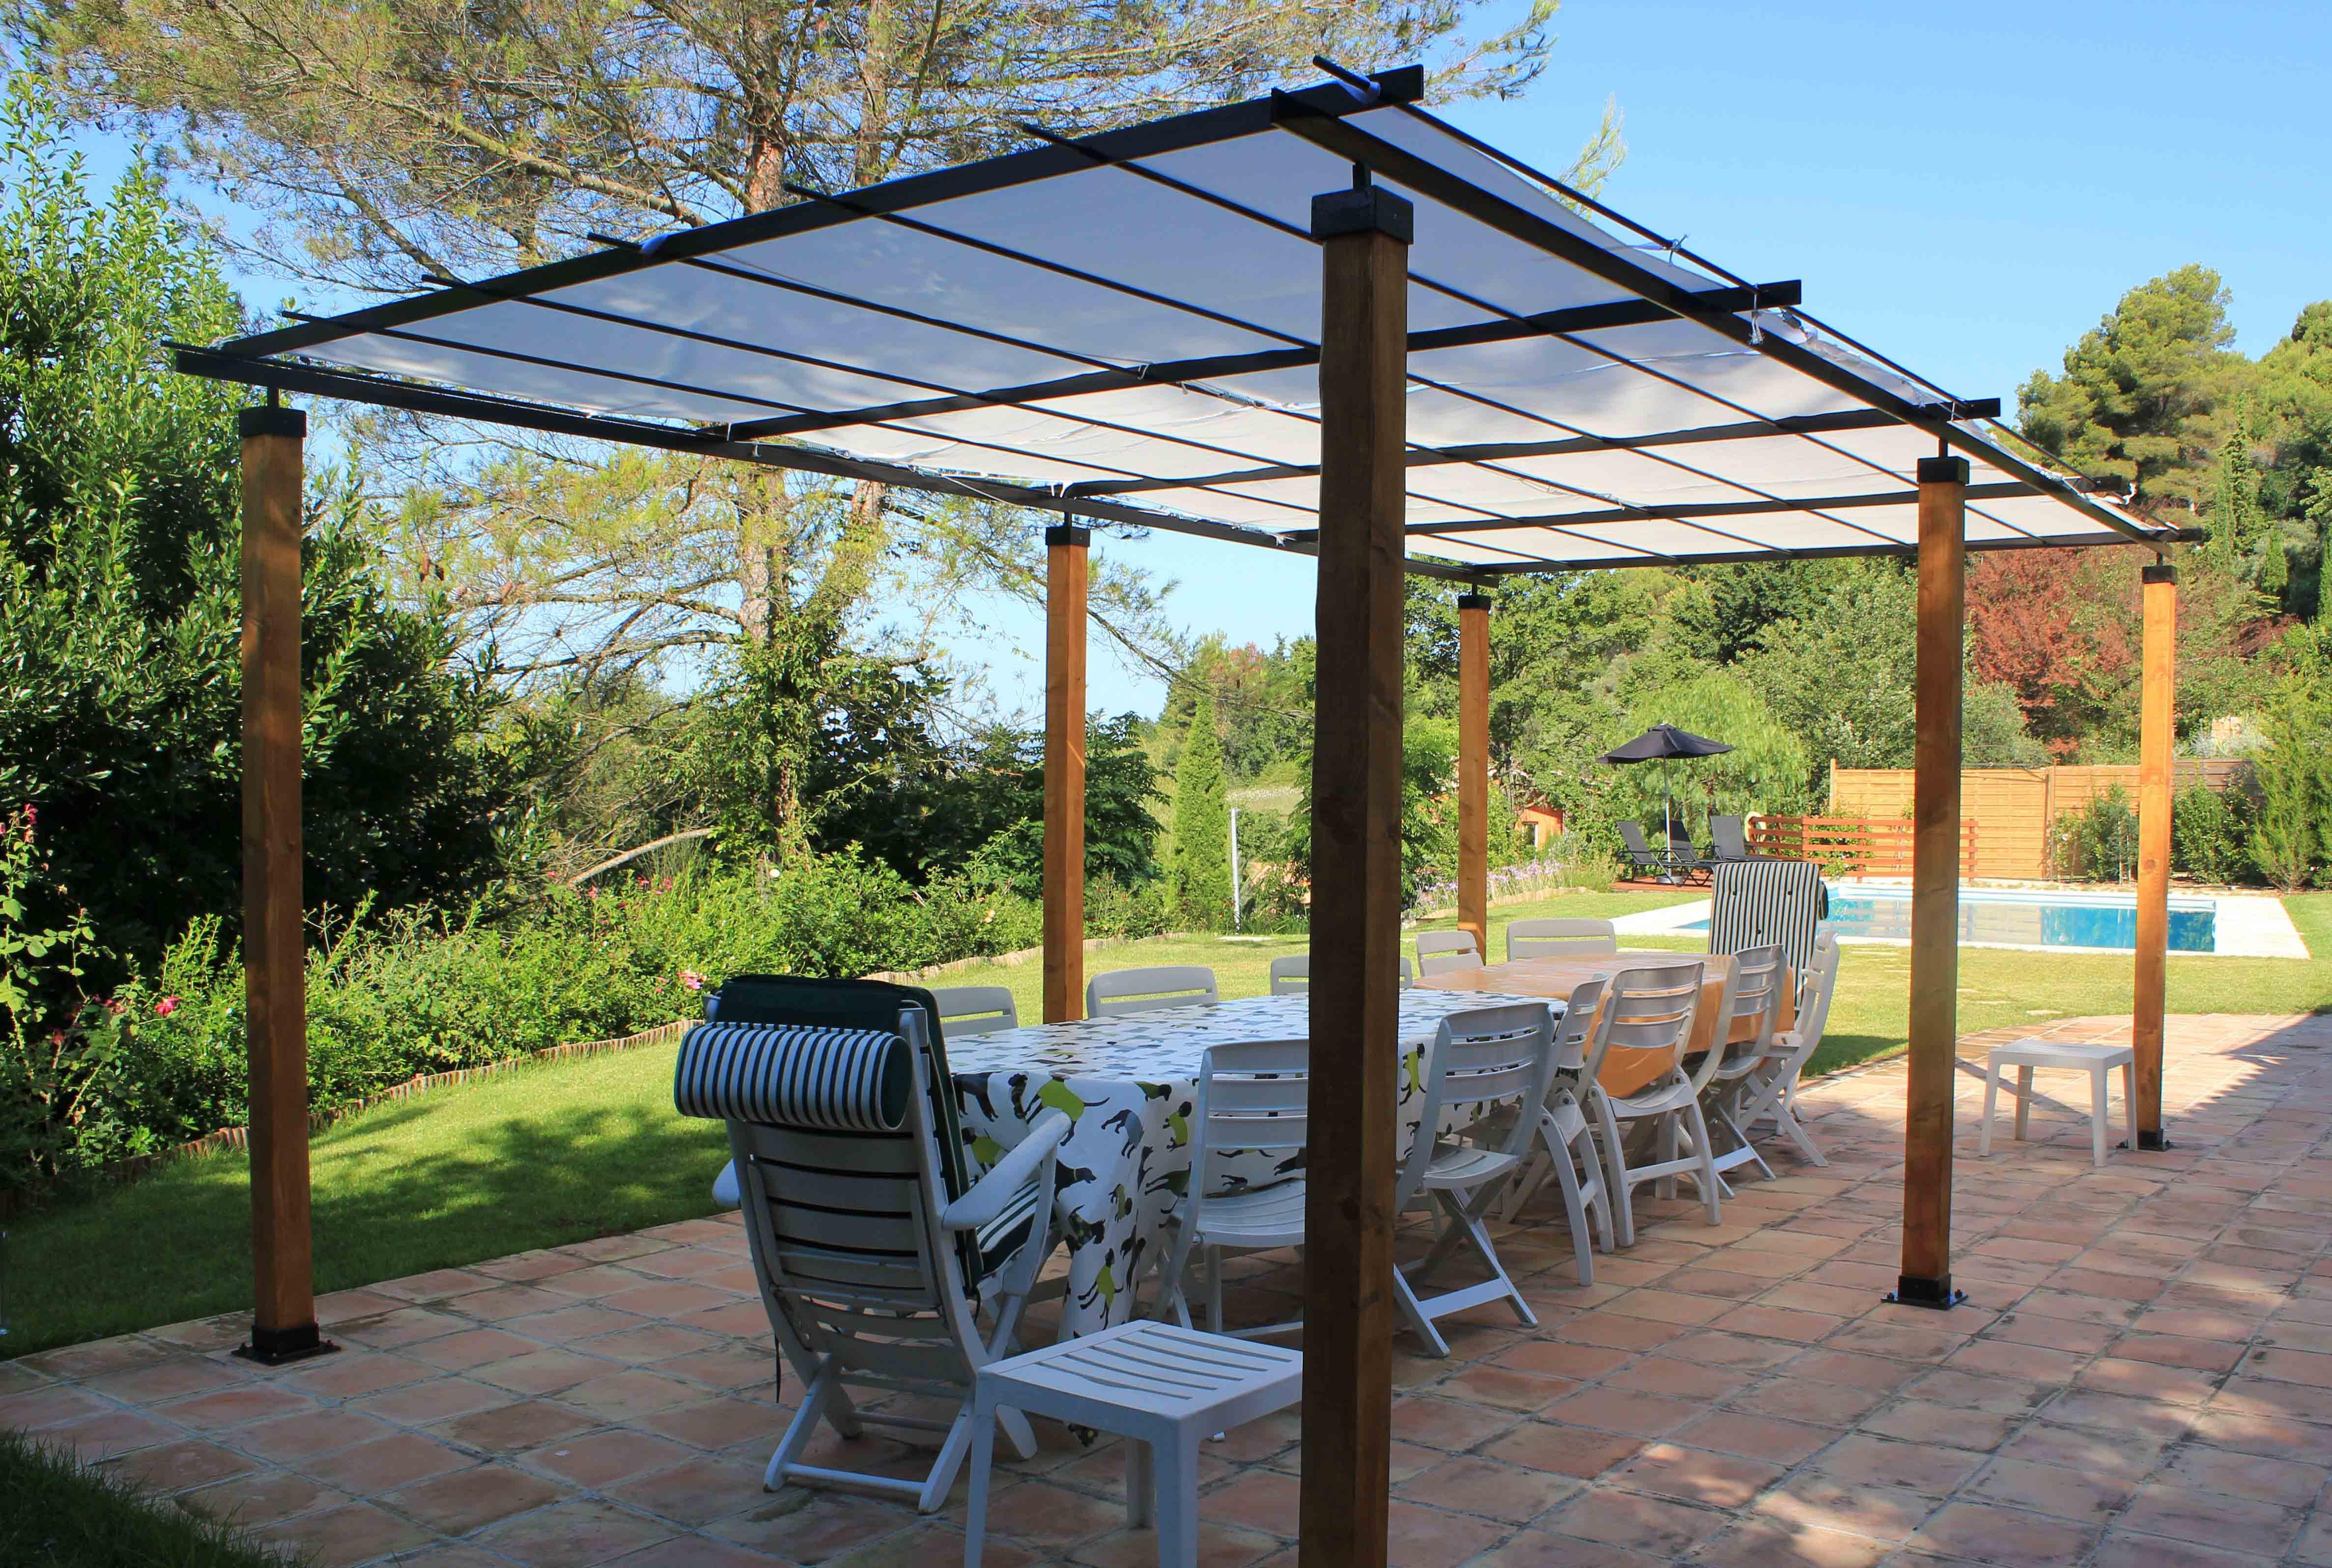 Mougins villa canelle aya appartmentsaya appartments for Terrace pergola